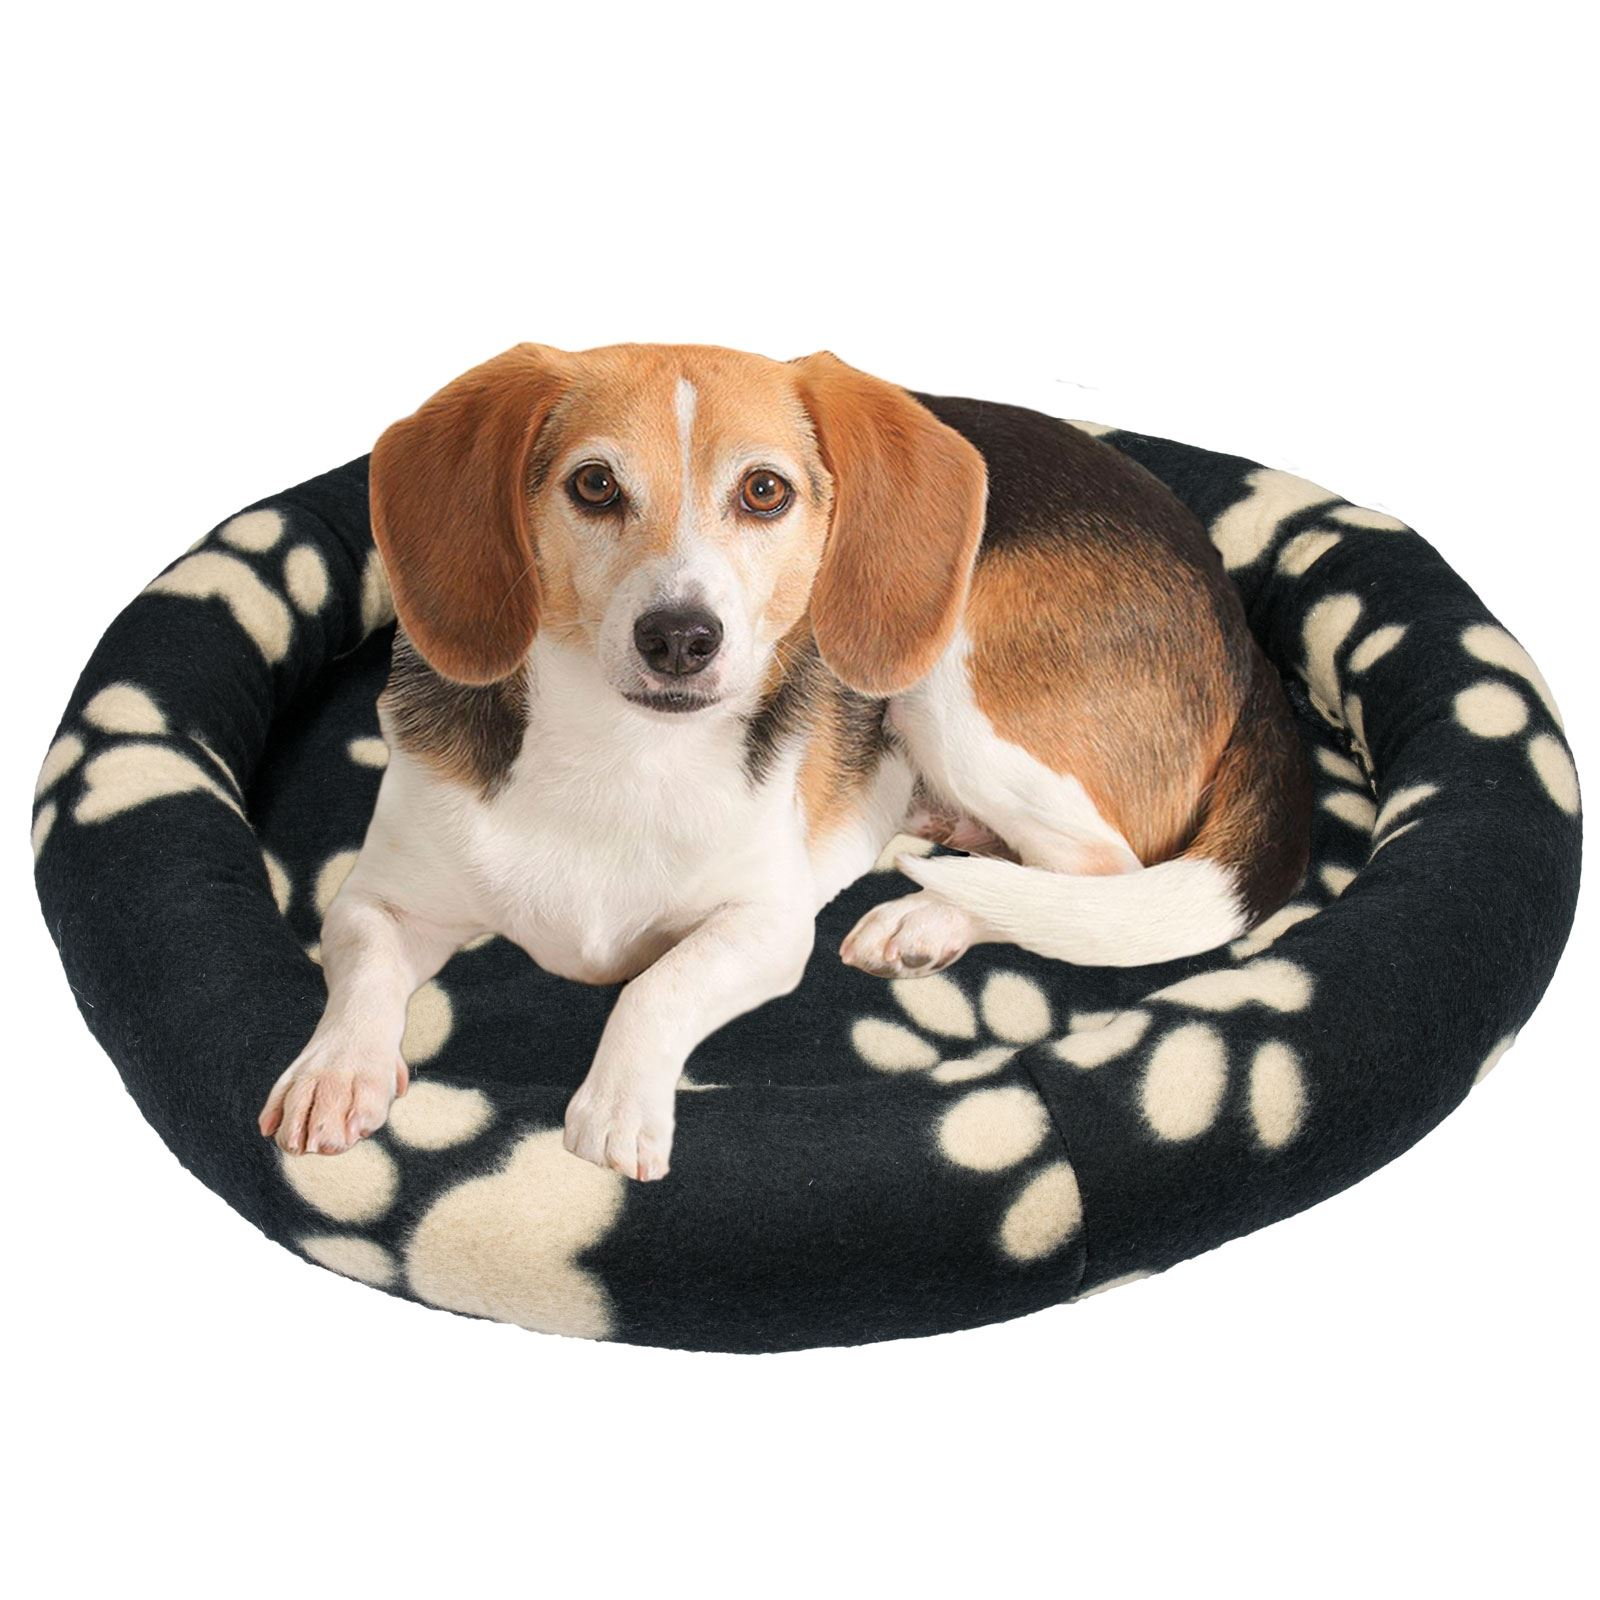 Donut Round Dog Beds